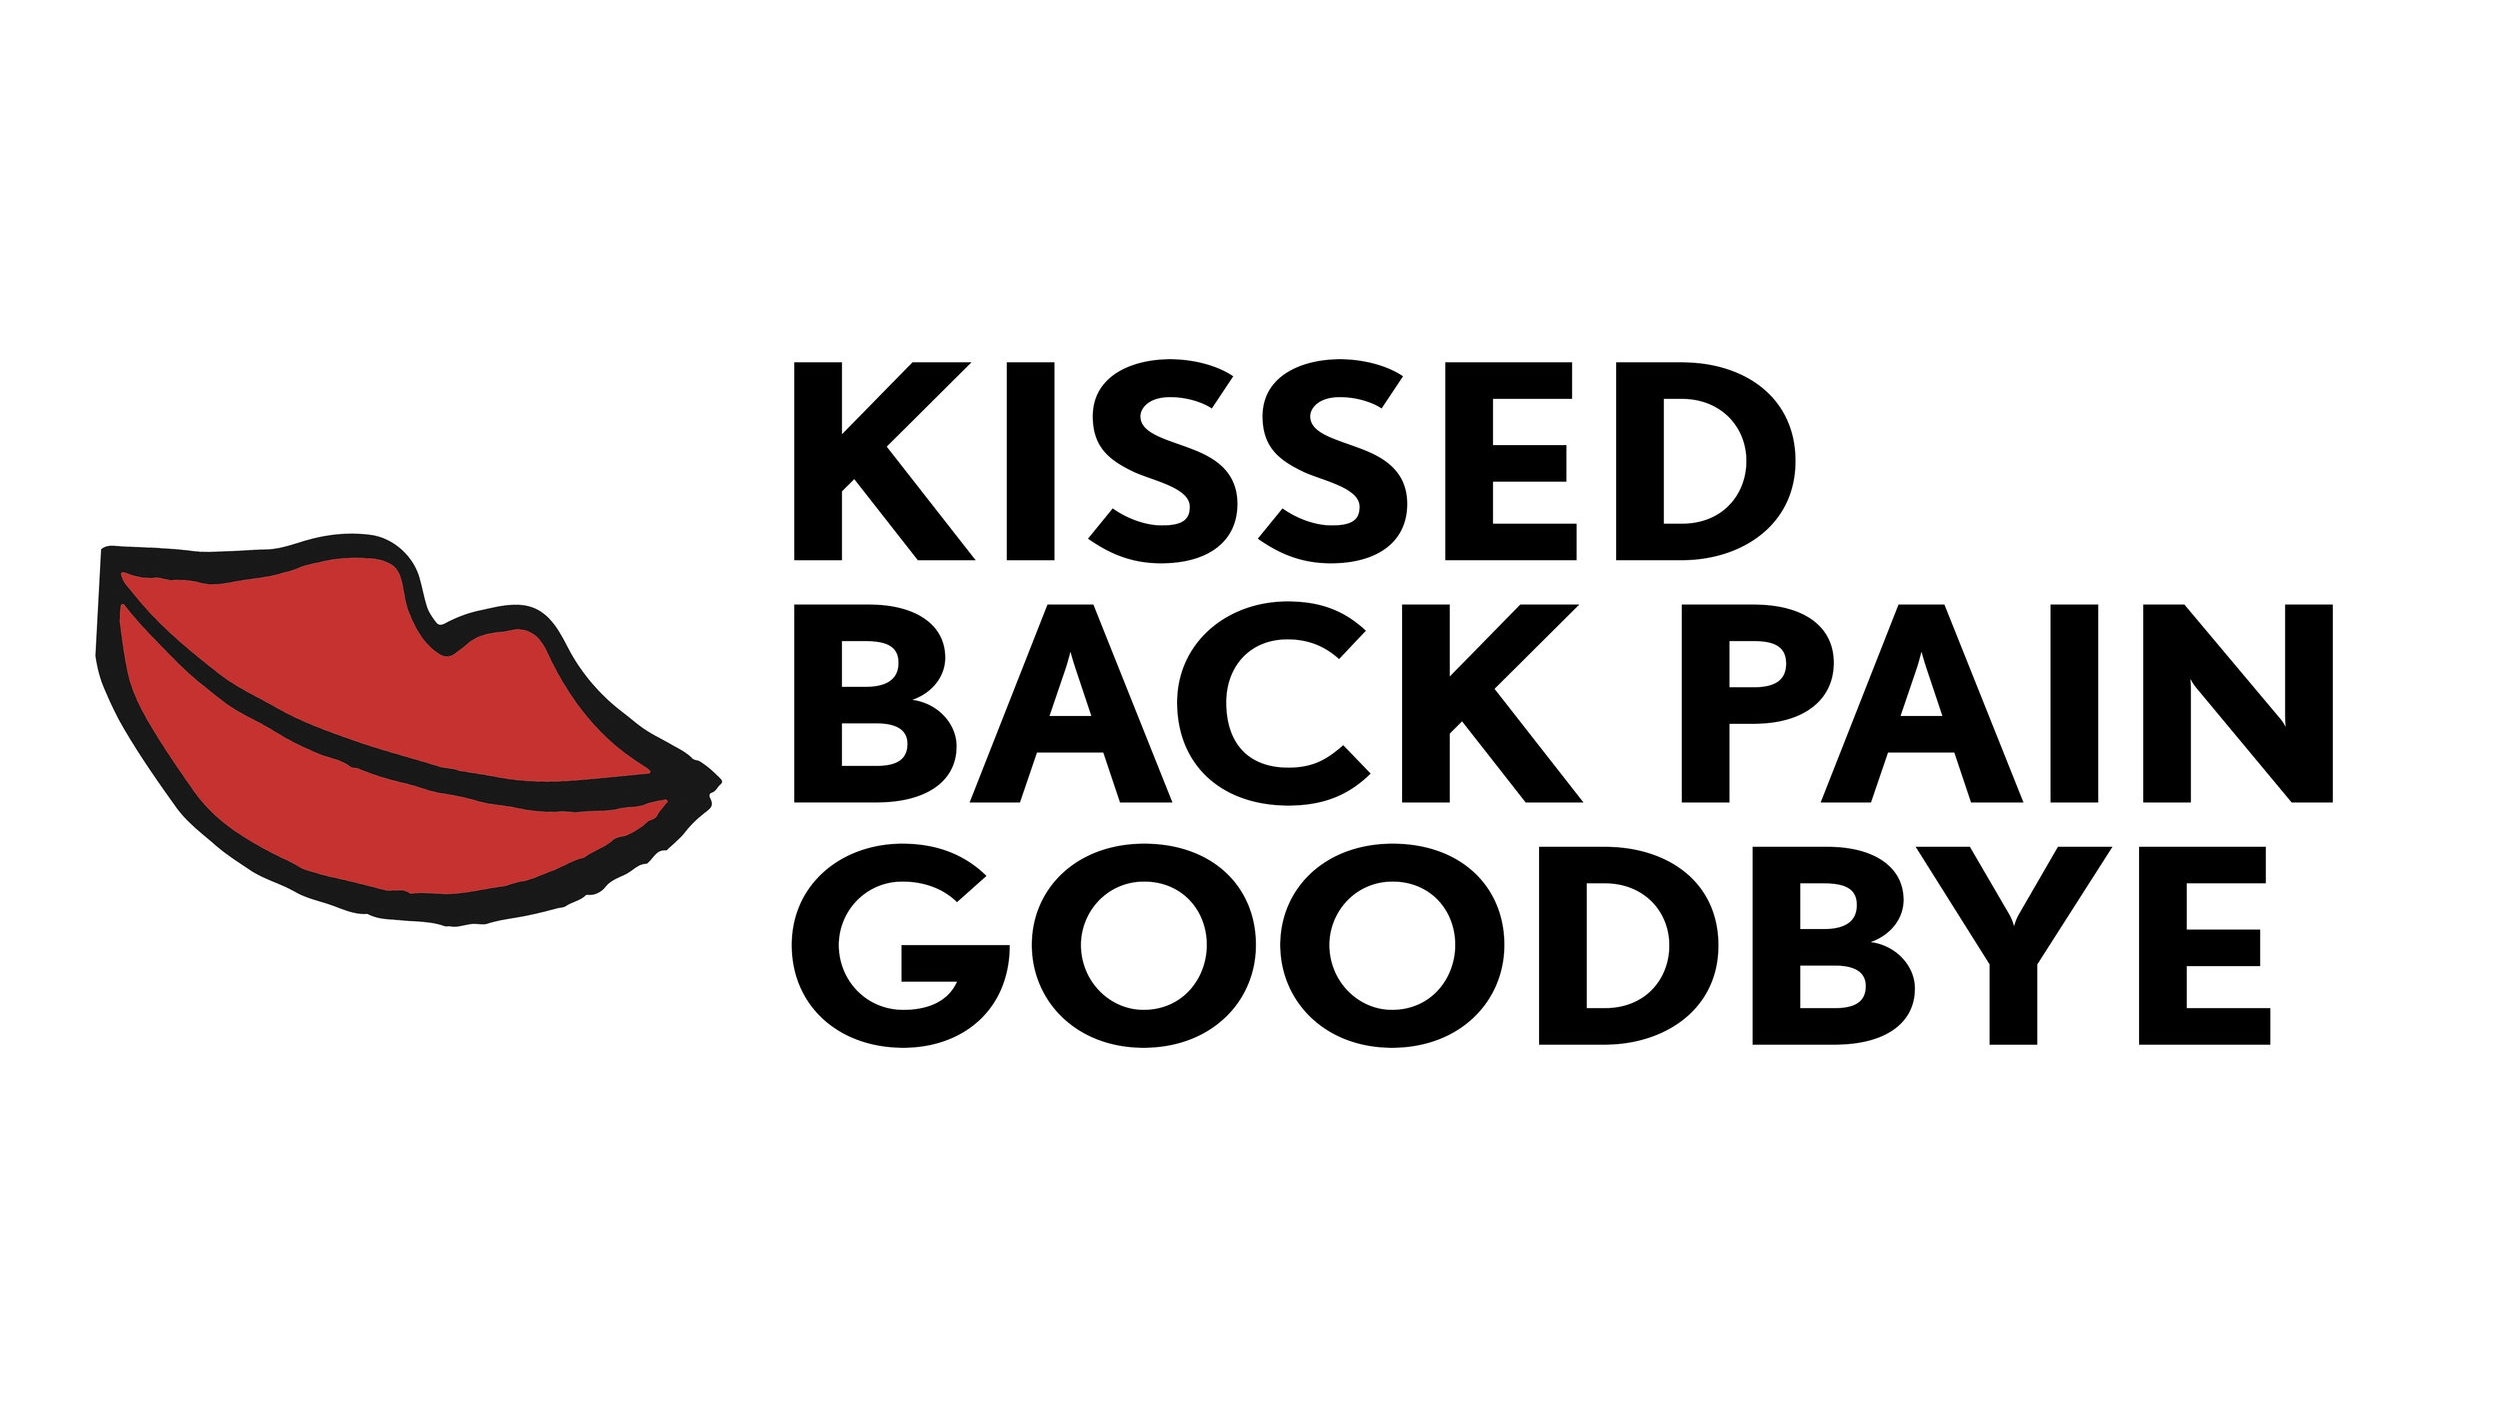 kiss back pain good bye.jpg